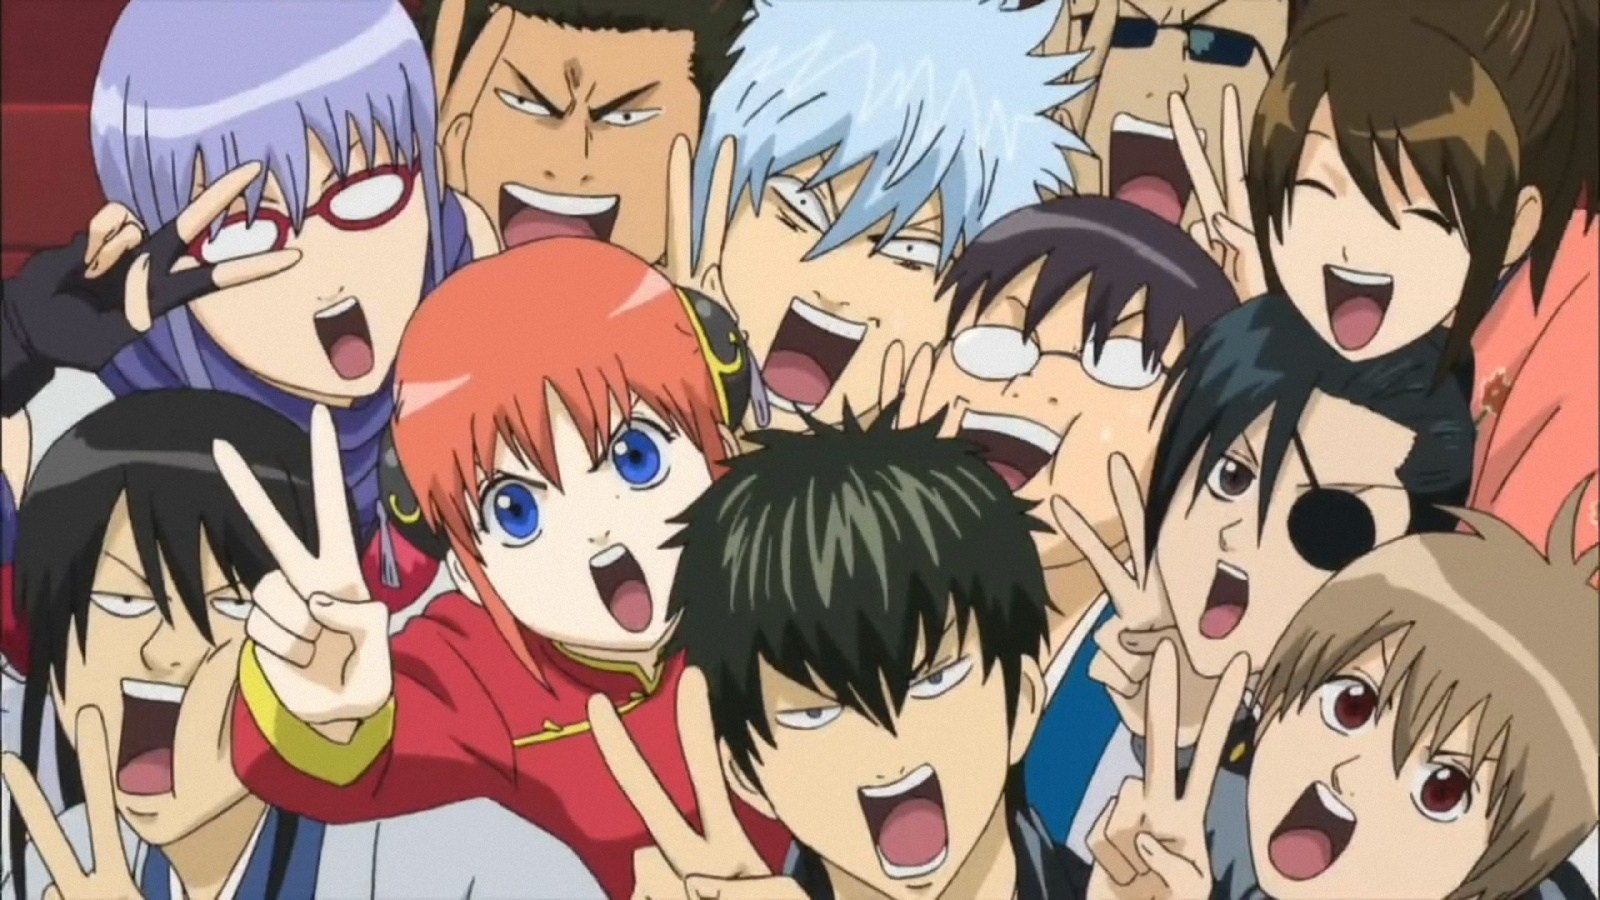 HD Quality Wallpaper | Collection: Anime, 1600x900 Gintama